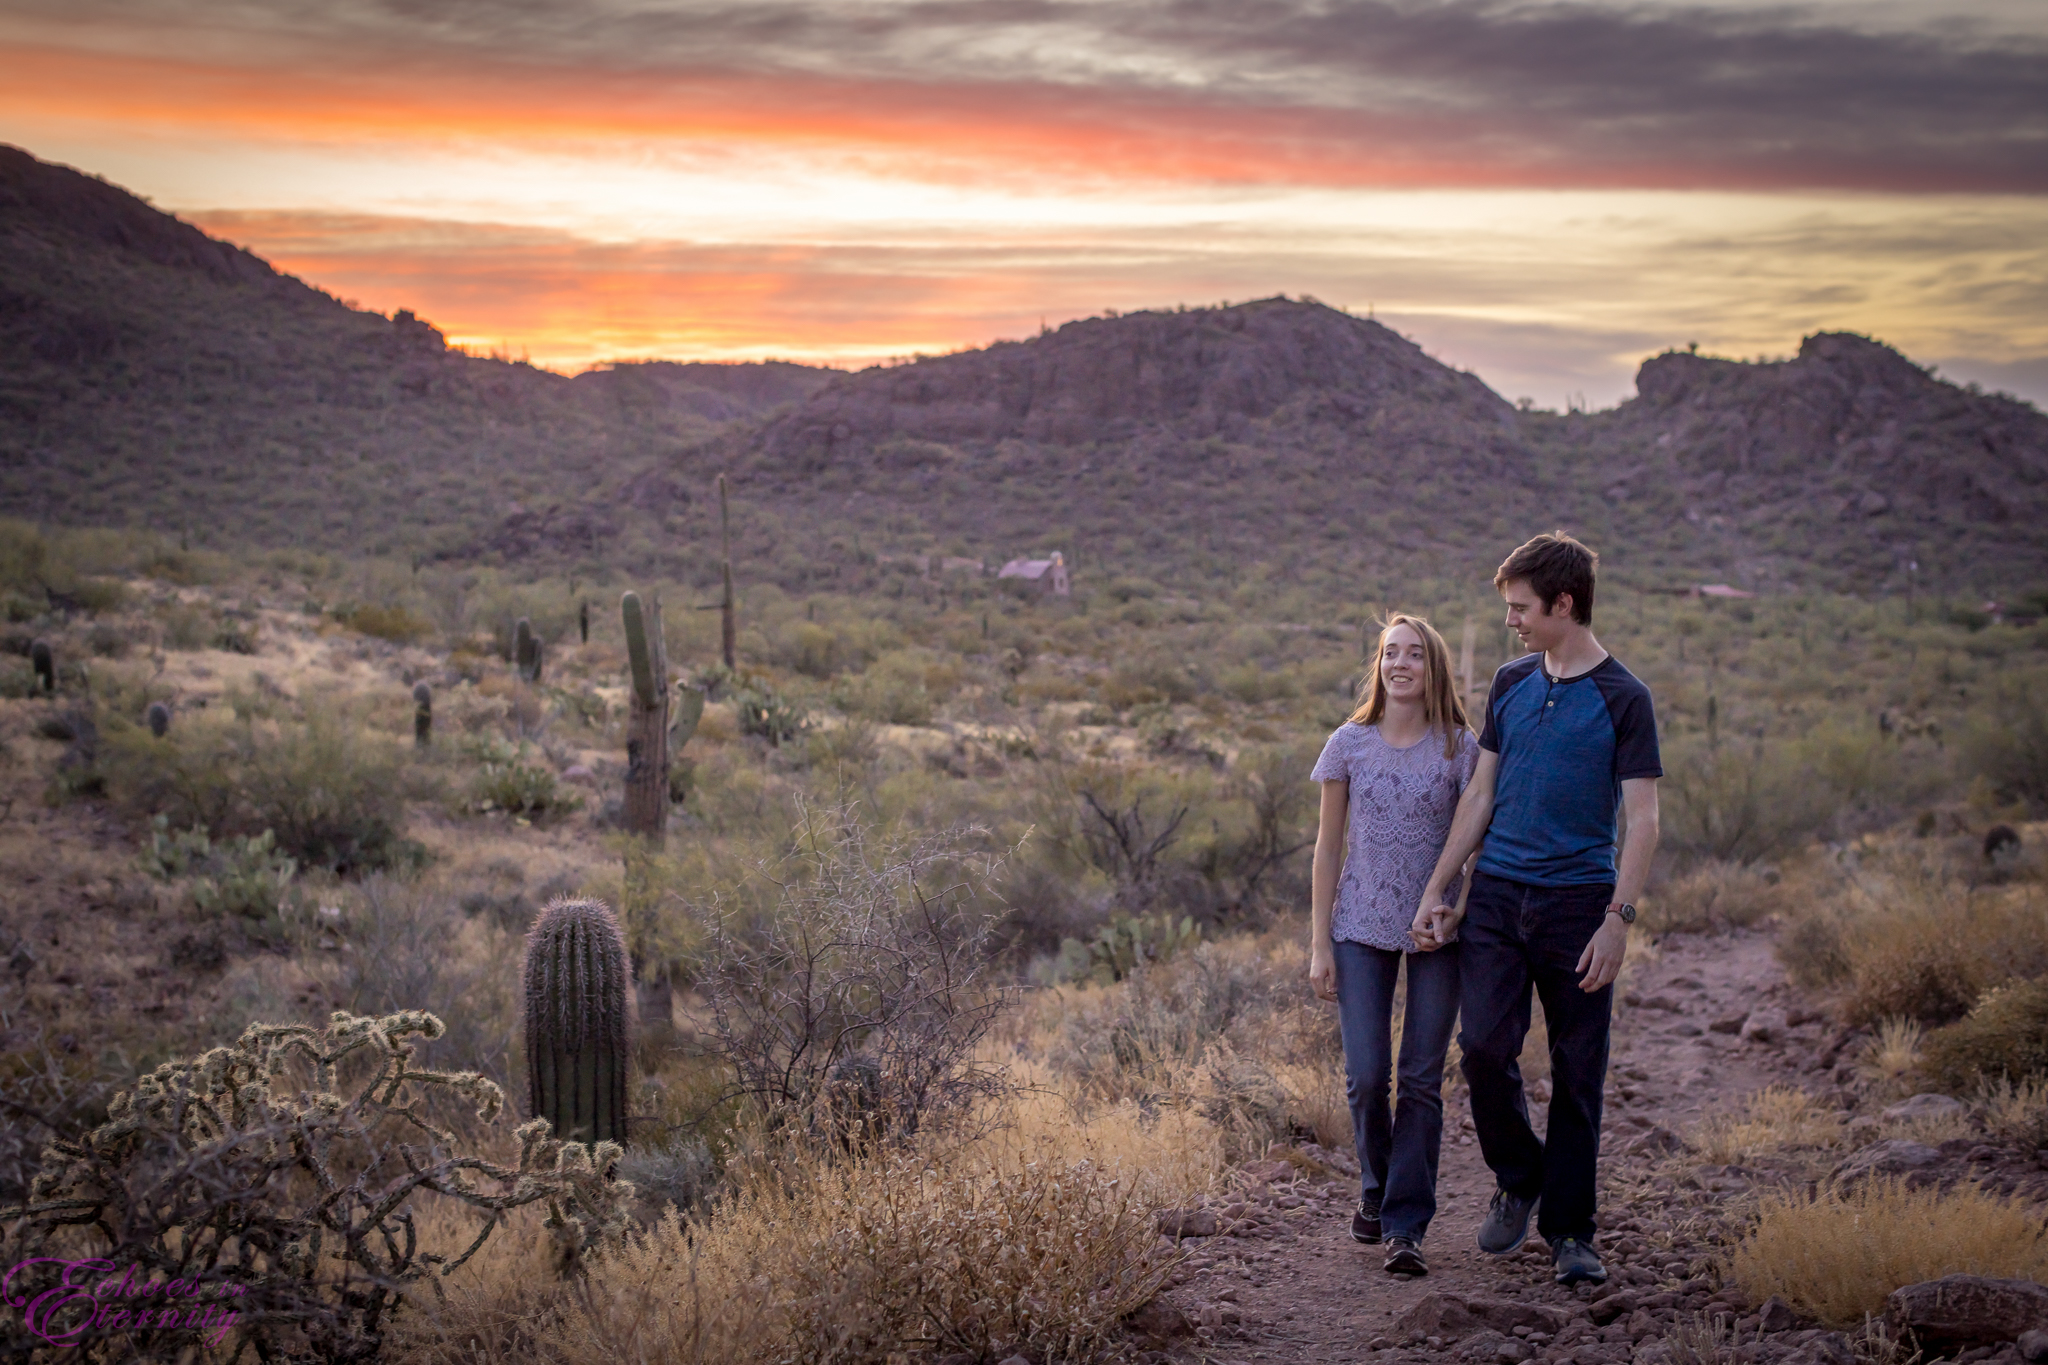 Jeremiah and Hannah Tucson Wedding and Engagement Photographer Sanctuary Cove 10.jpg